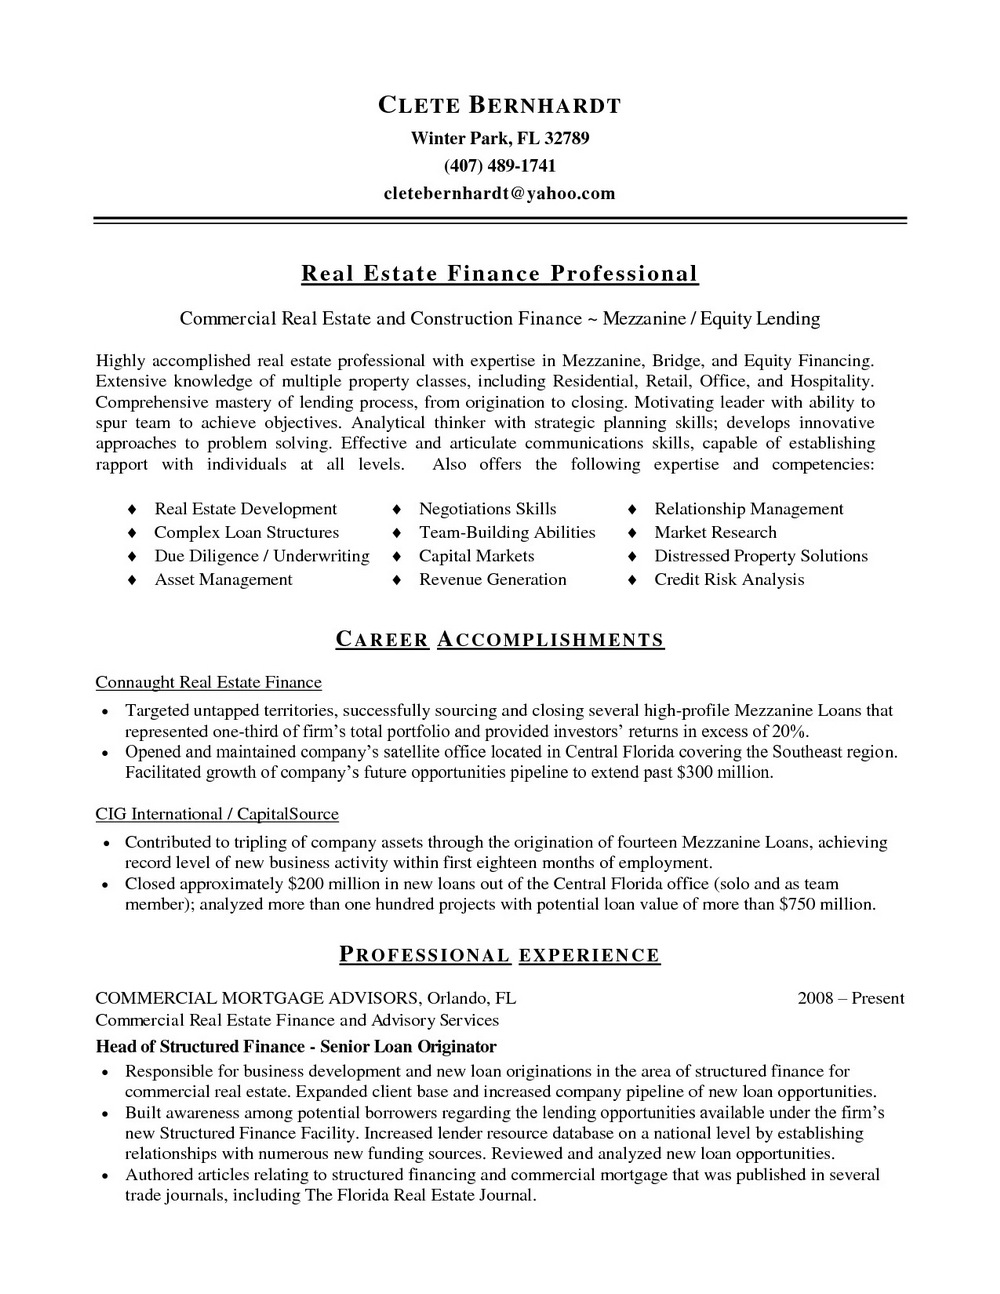 Real Estate Investor Resume